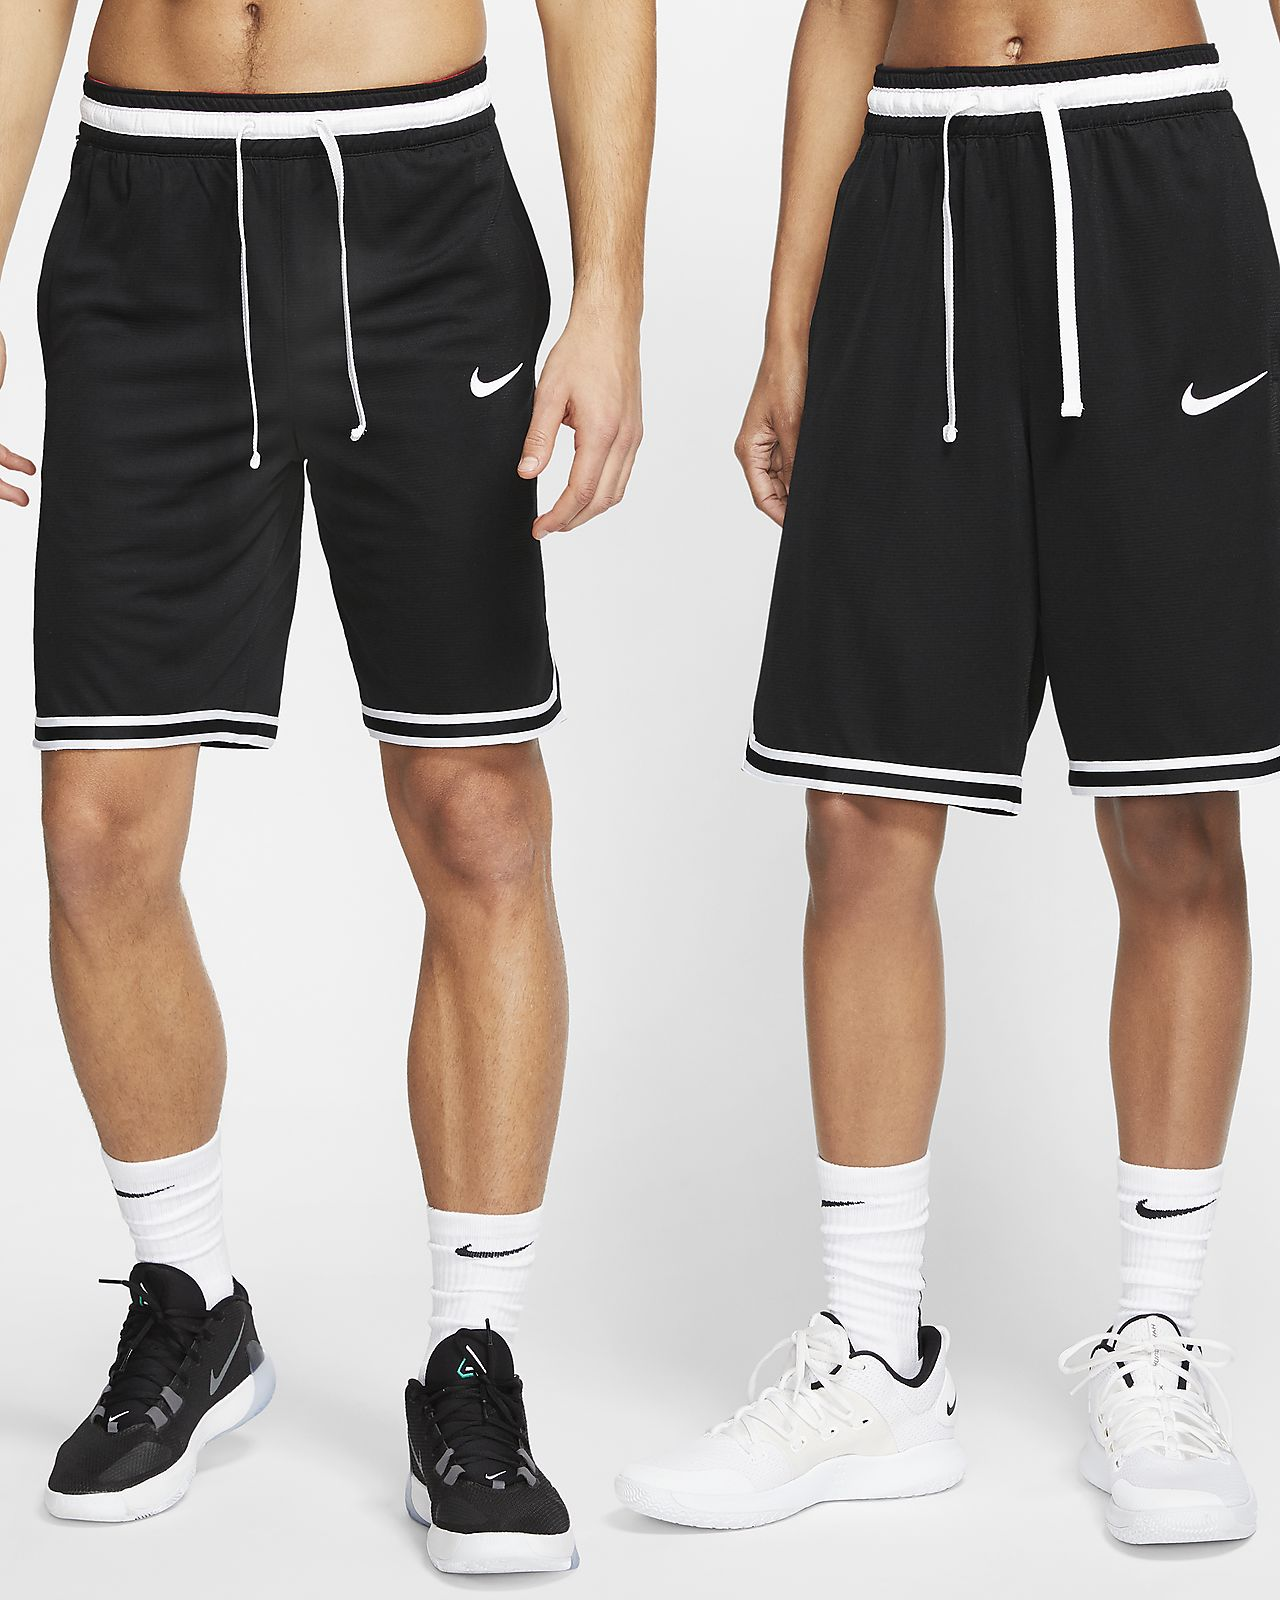 Nike Dri Dna Short Basketball Fit De kXPZuOTi